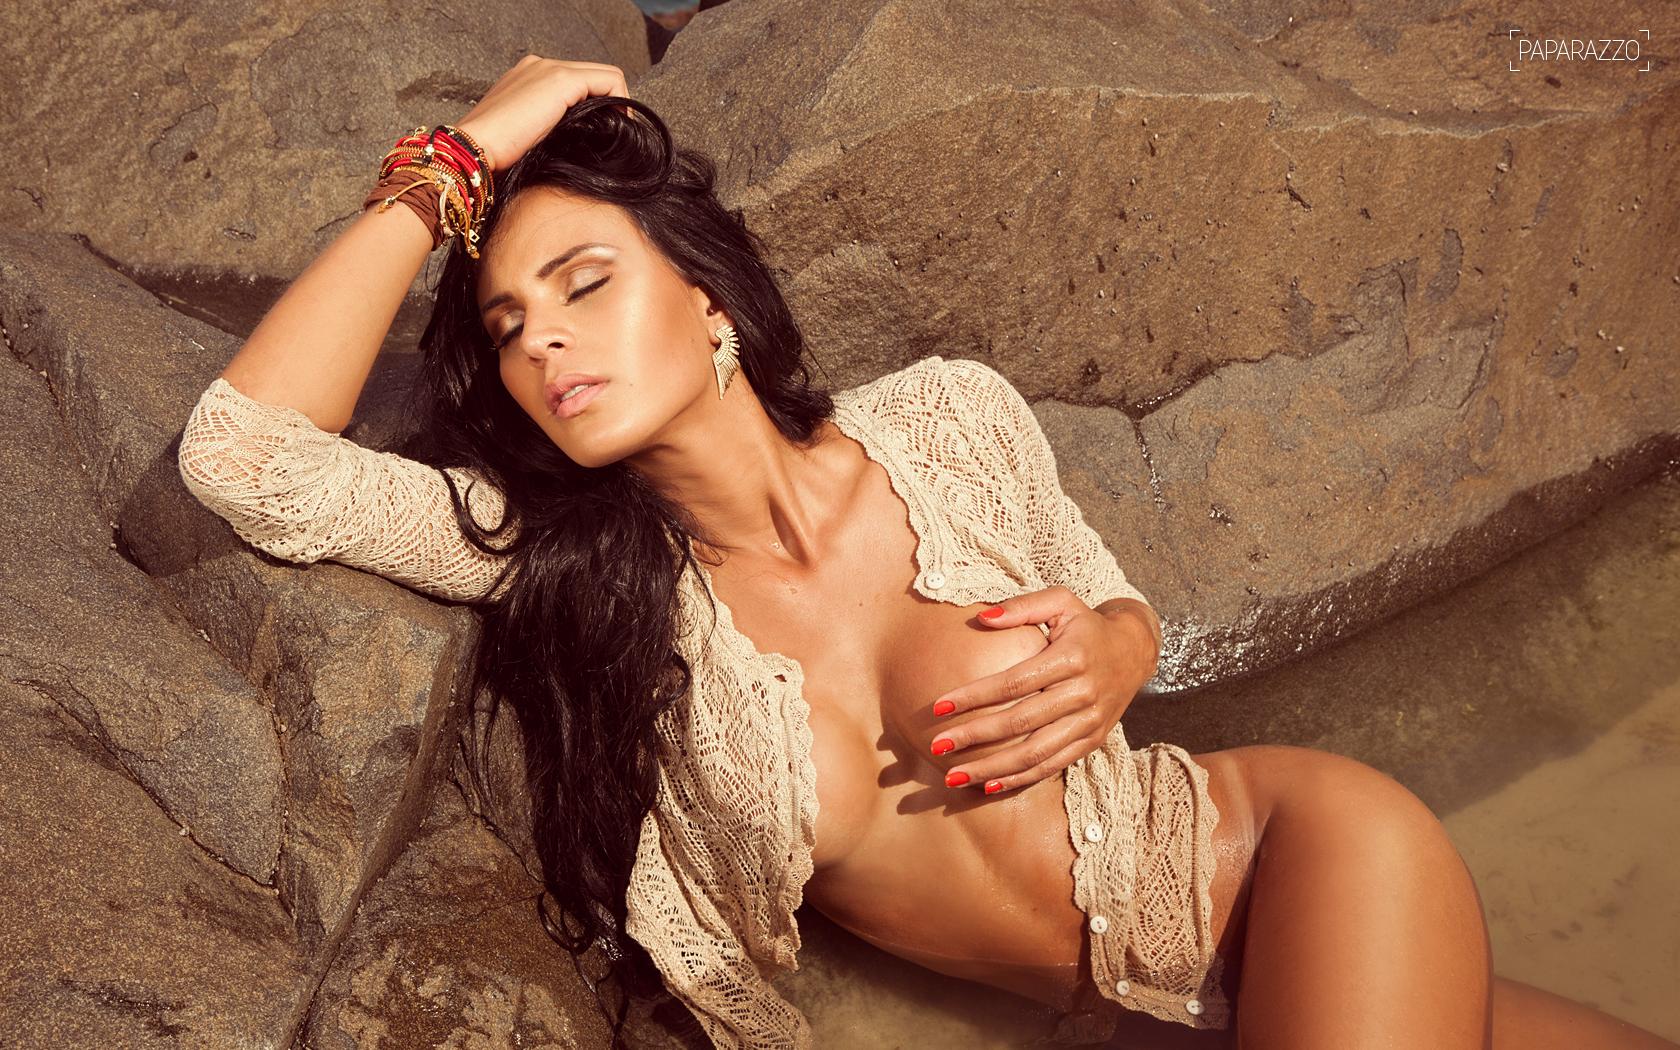 Sexy Lorena Bueri nudes (97 photo), Pussy, Paparazzi, Twitter, butt 2020